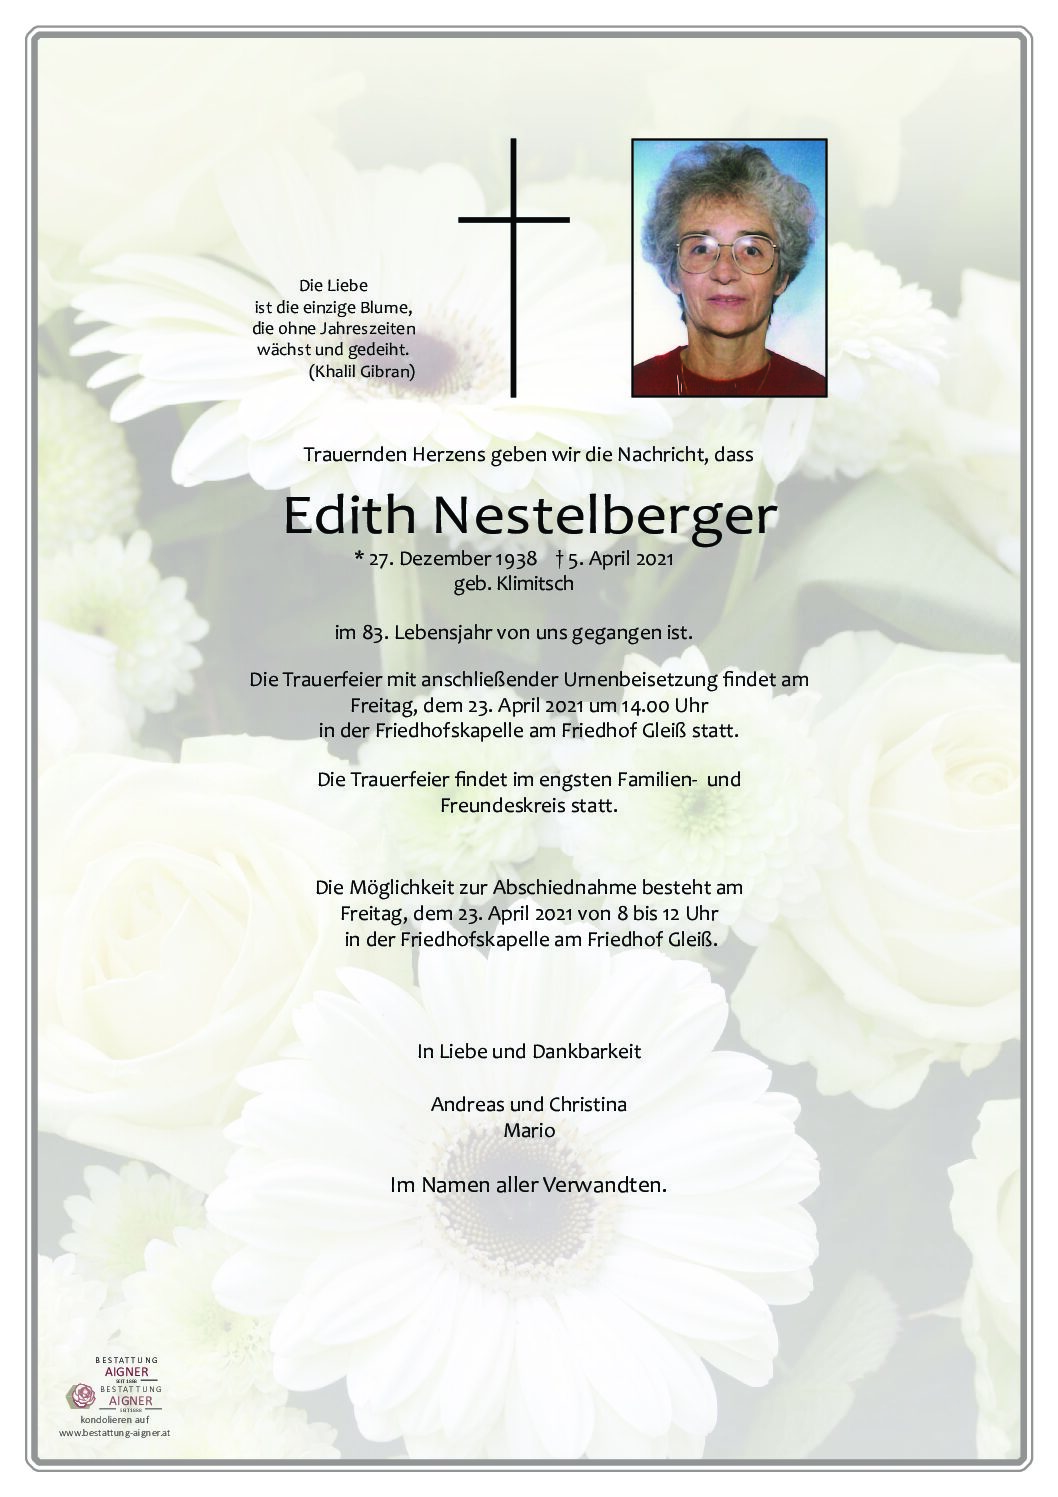 Edith Nestelberger